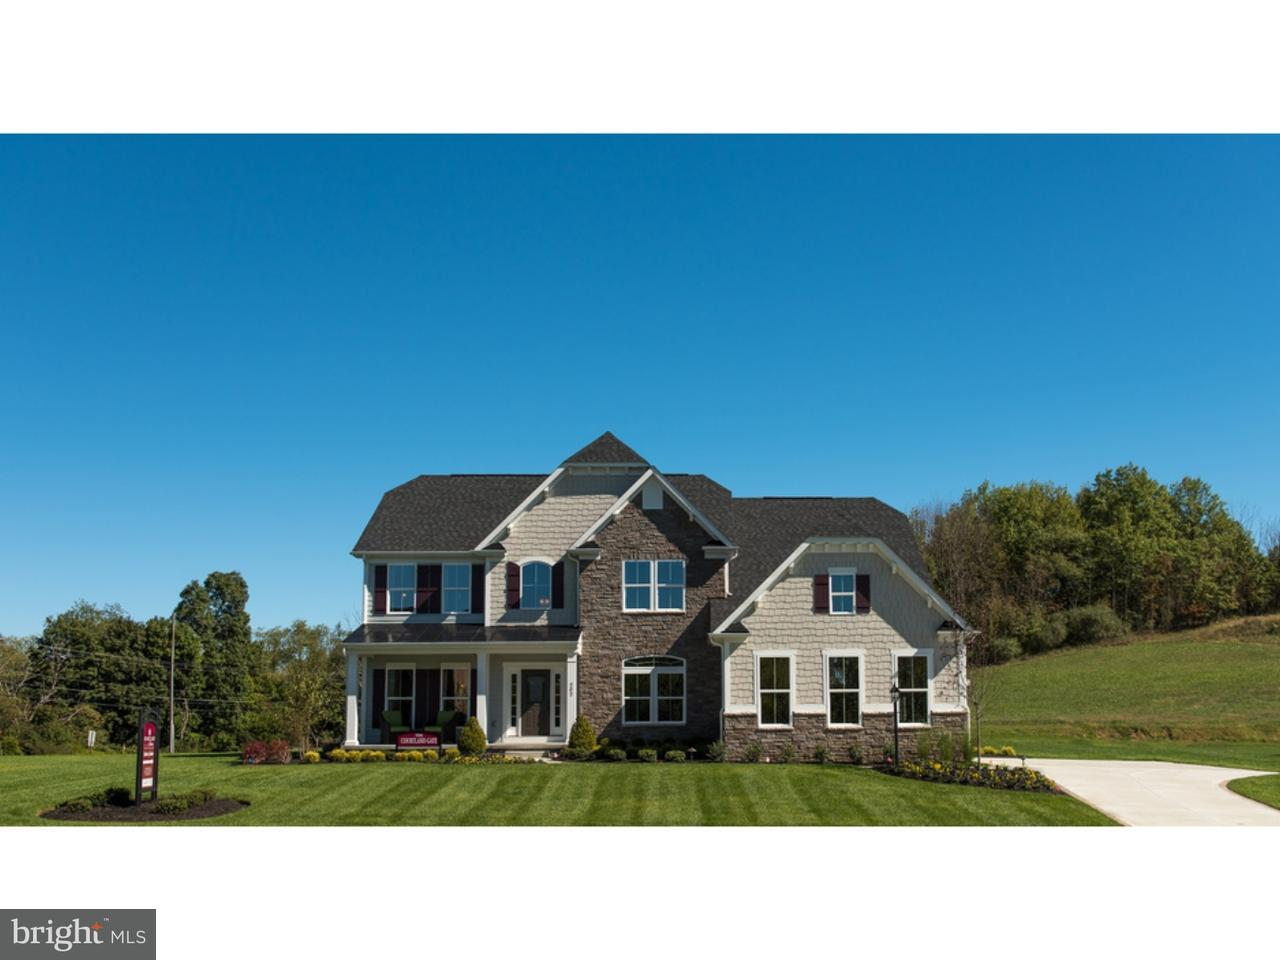 独户住宅 为 销售 在 500 PEAR TREE Court Delran Township, 新泽西州 08075 美国